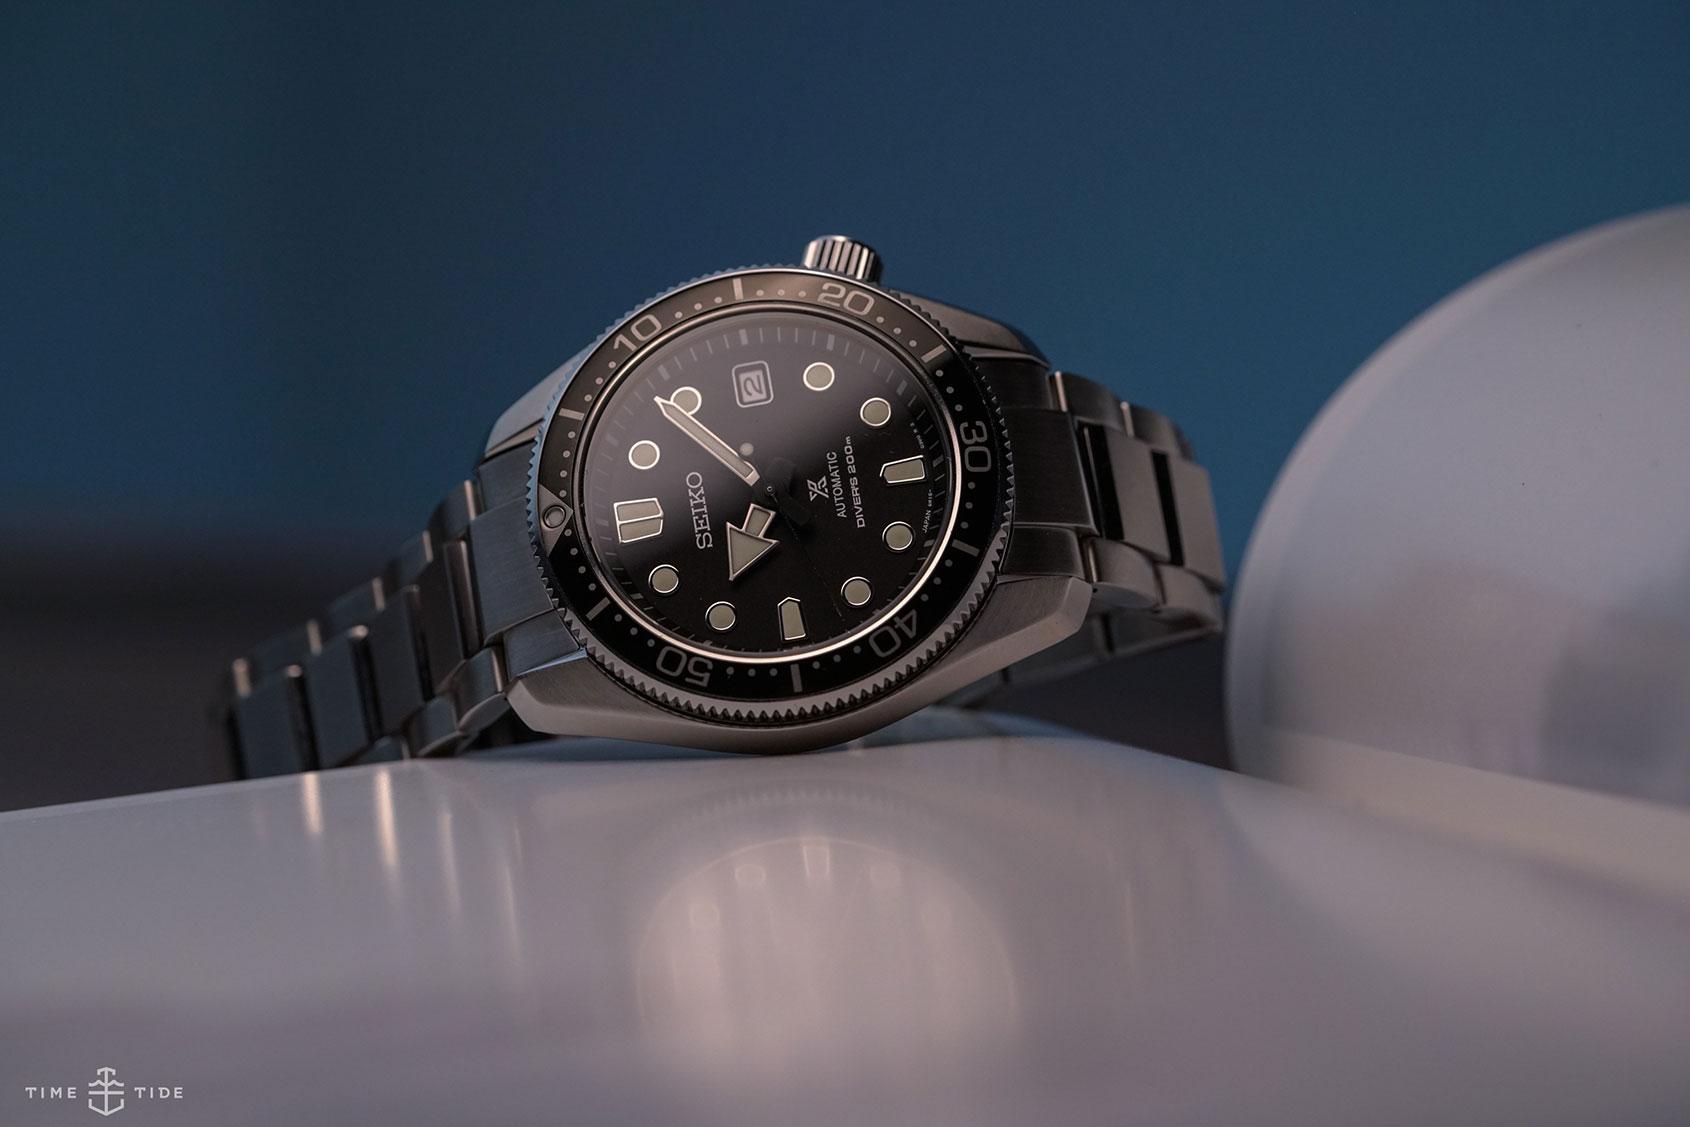 EDITOR'S PICK: History made modern – The Seiko 1968 Automatic Diver's Modern Re-interpretations